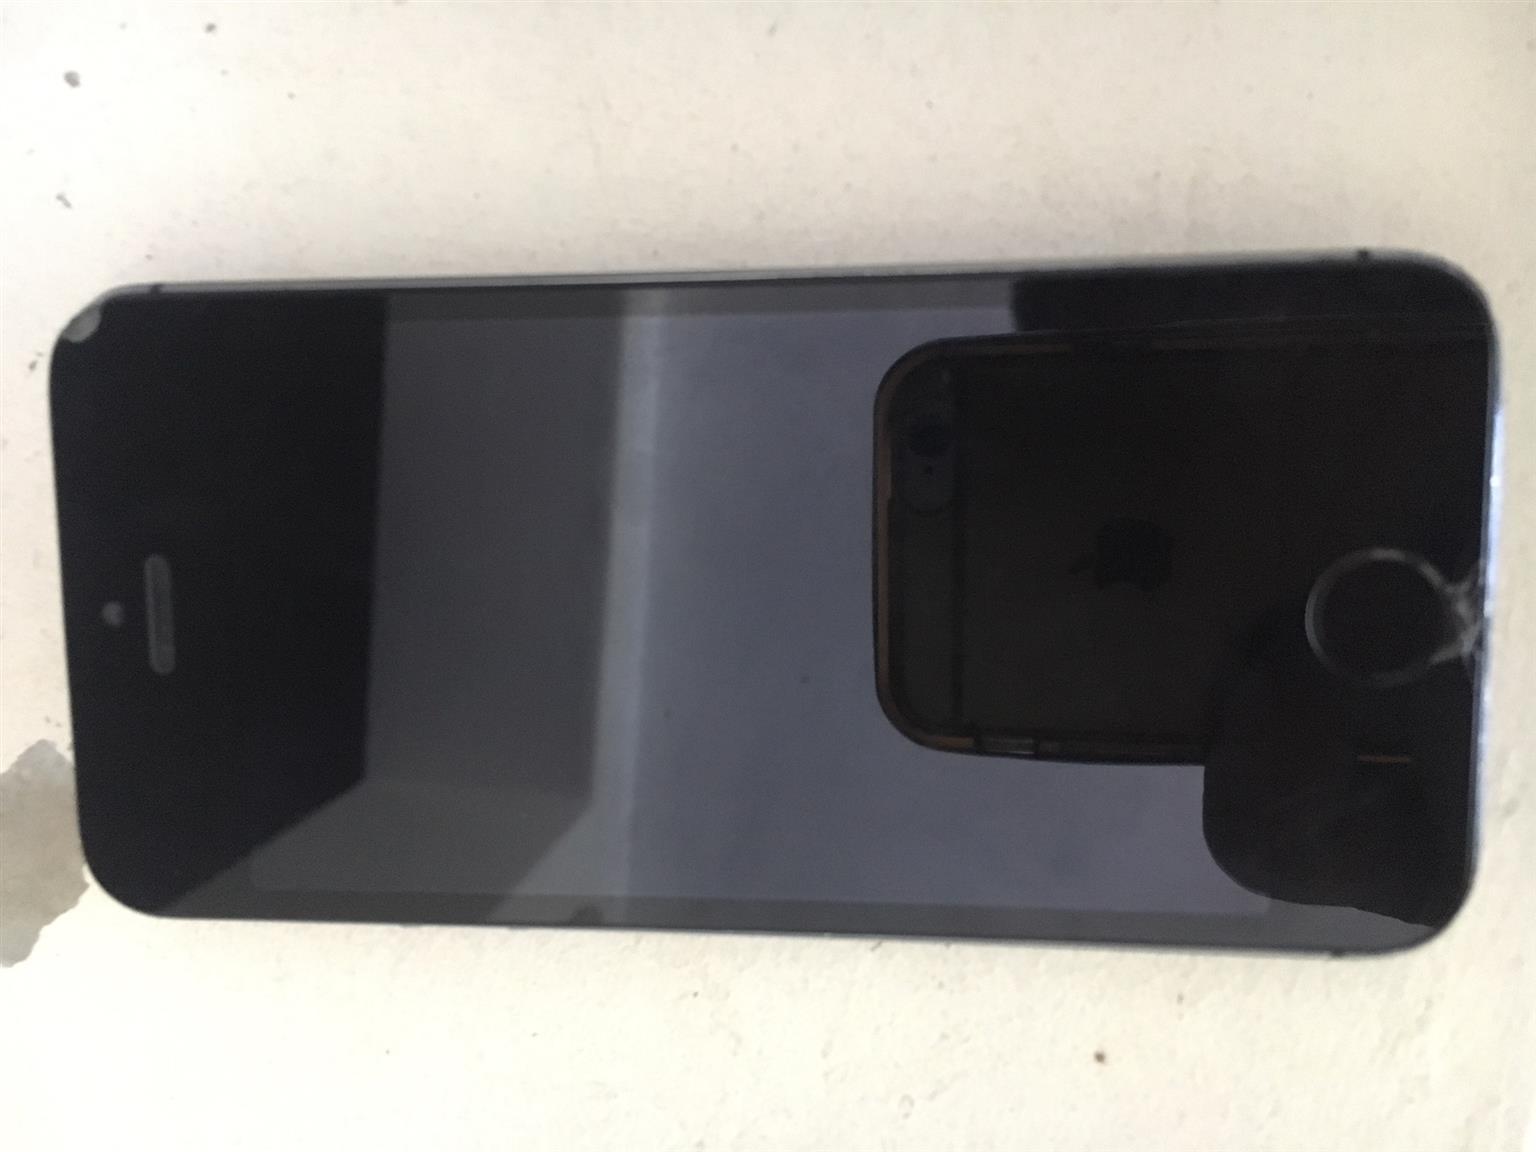 iPhone 5 - NOT SWITCHNIG ON